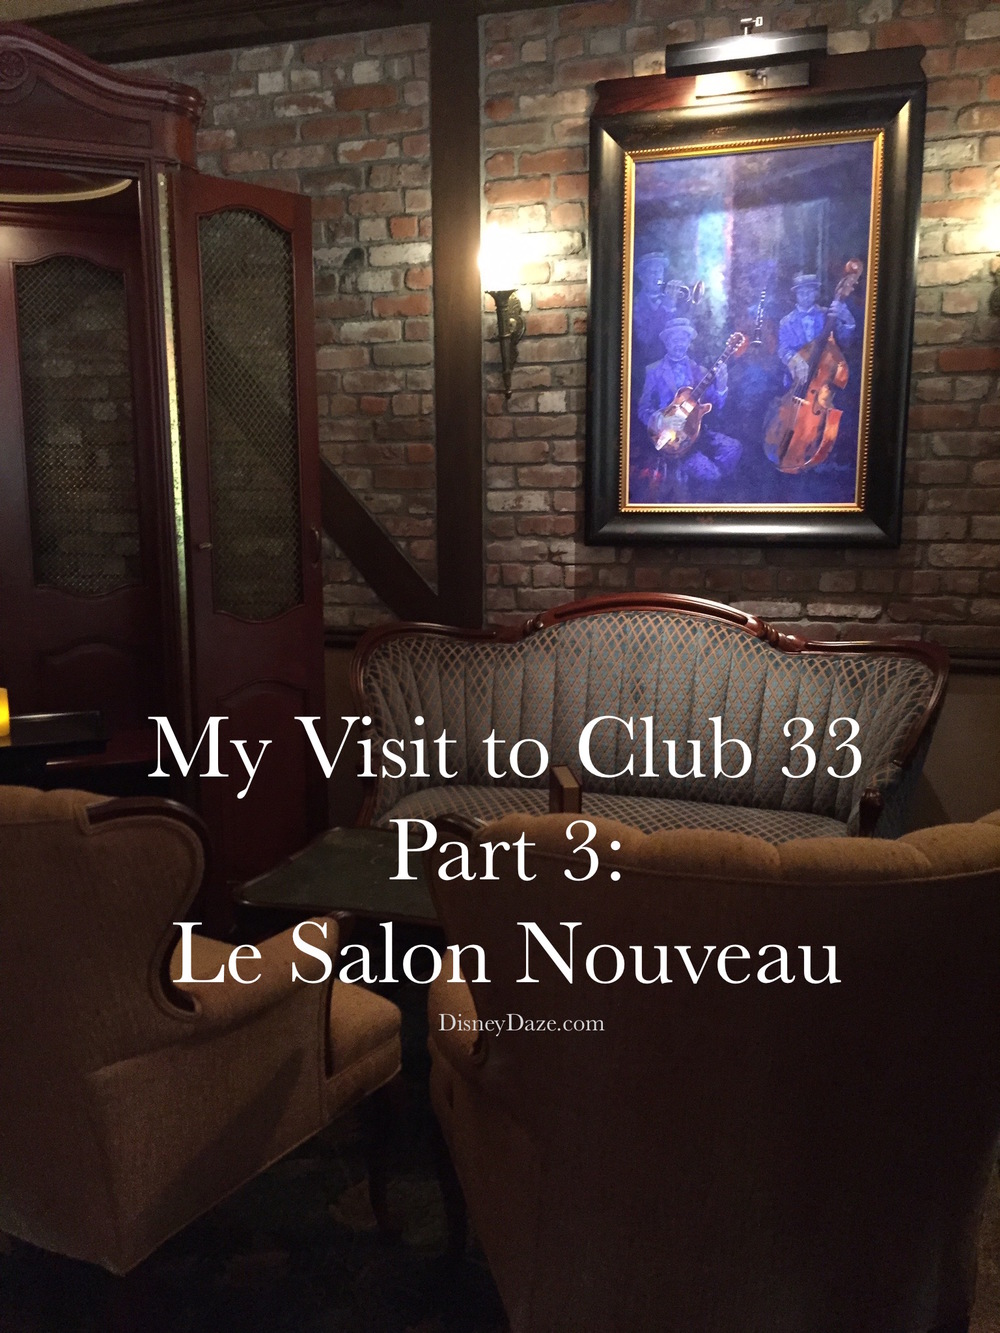 My Visit to Club 33 Part 3 - Disneydaze.com